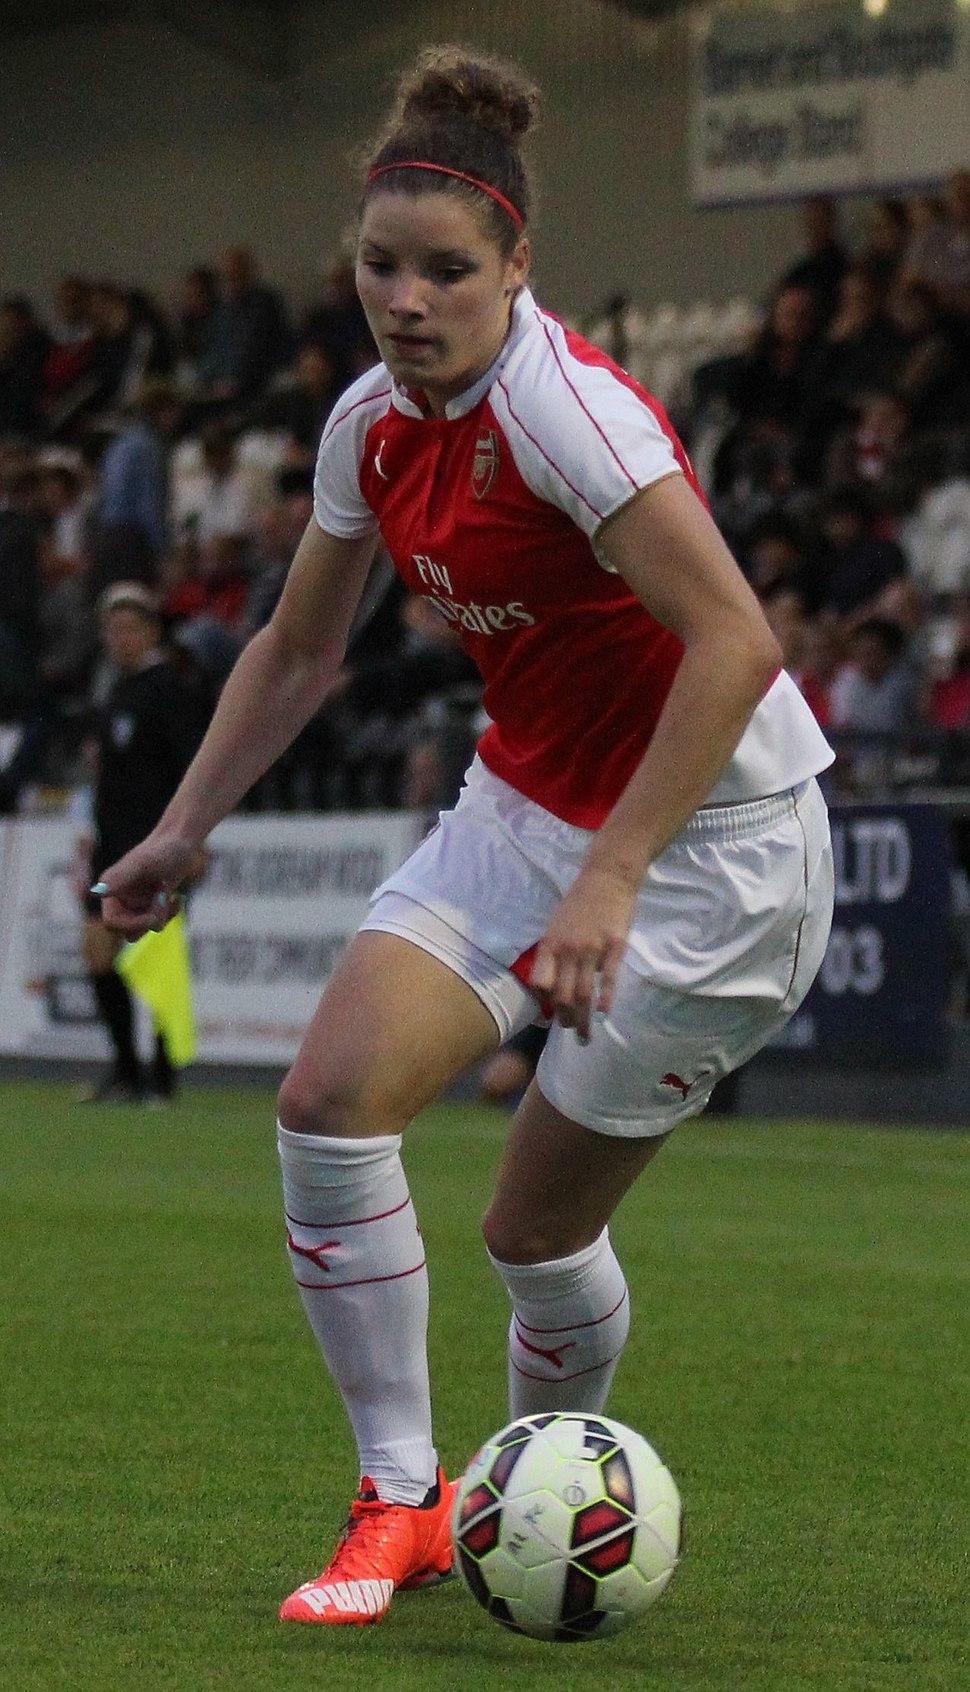 Dominique Janssen Arsenal Ladies Vs Watford (19969645285) (cropped)